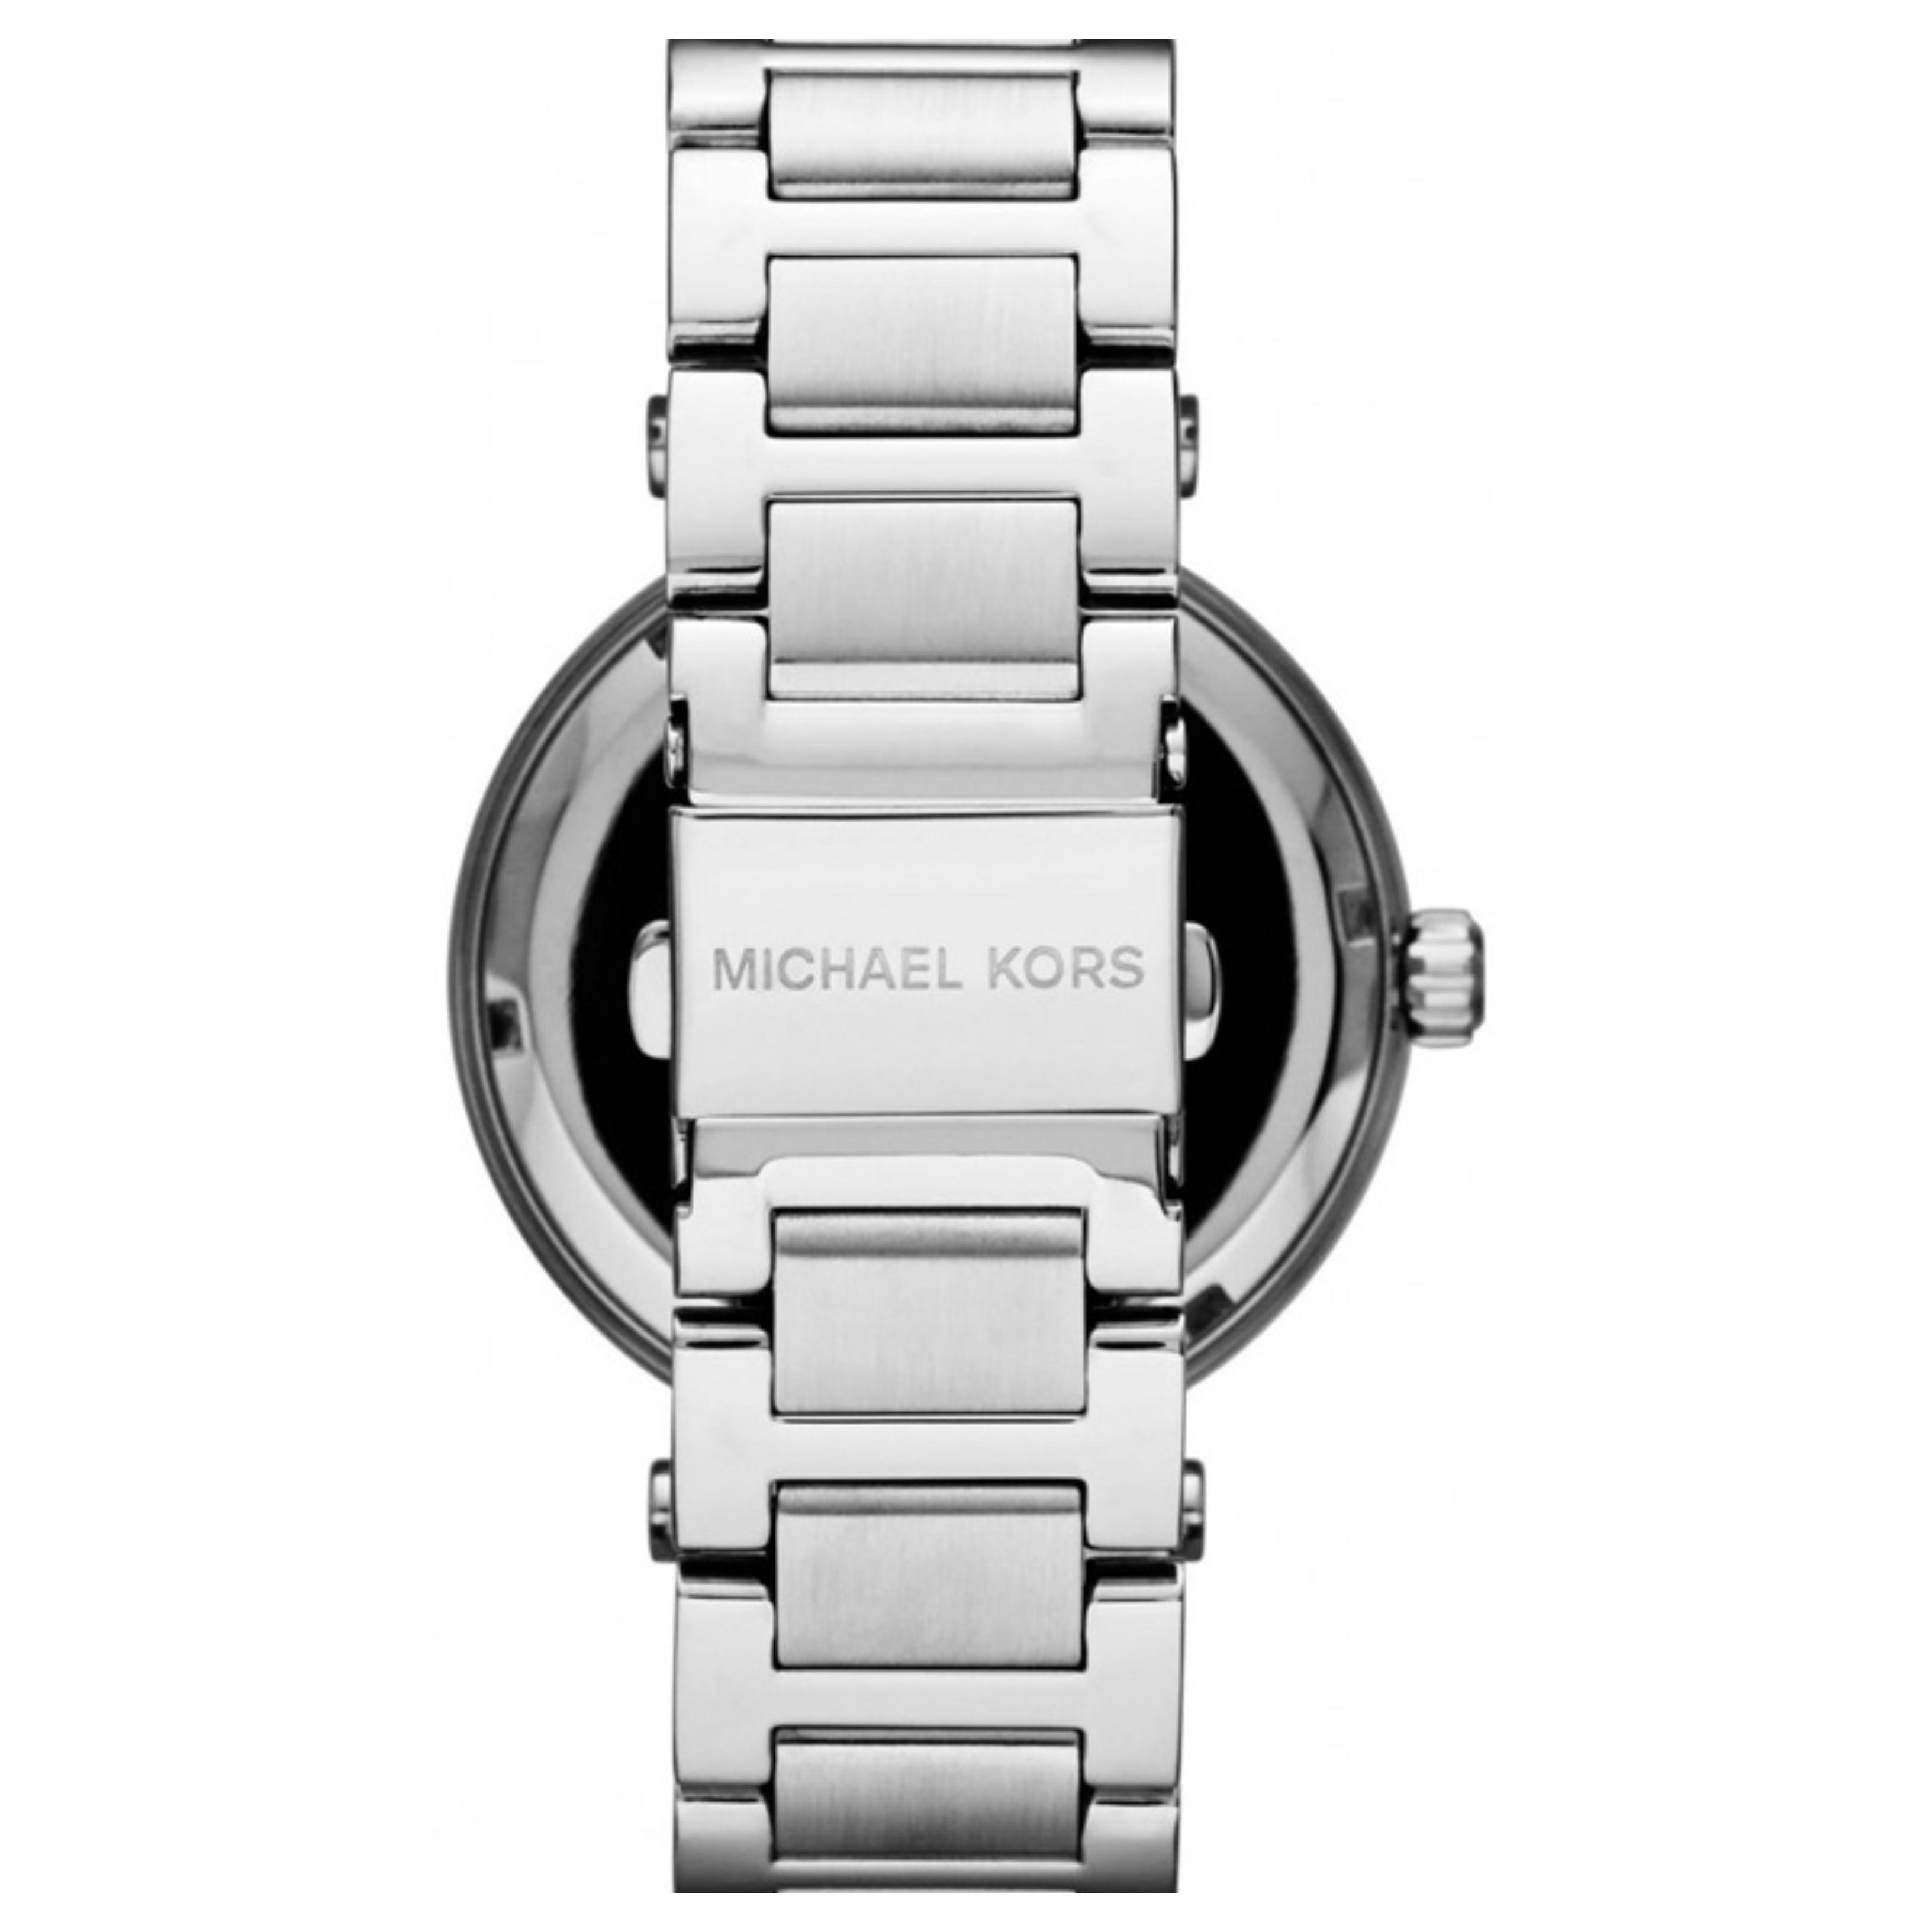 e84613dee8c9 Michael Kors Skylar Chronograph Stainless Steel Ladies Watch ...